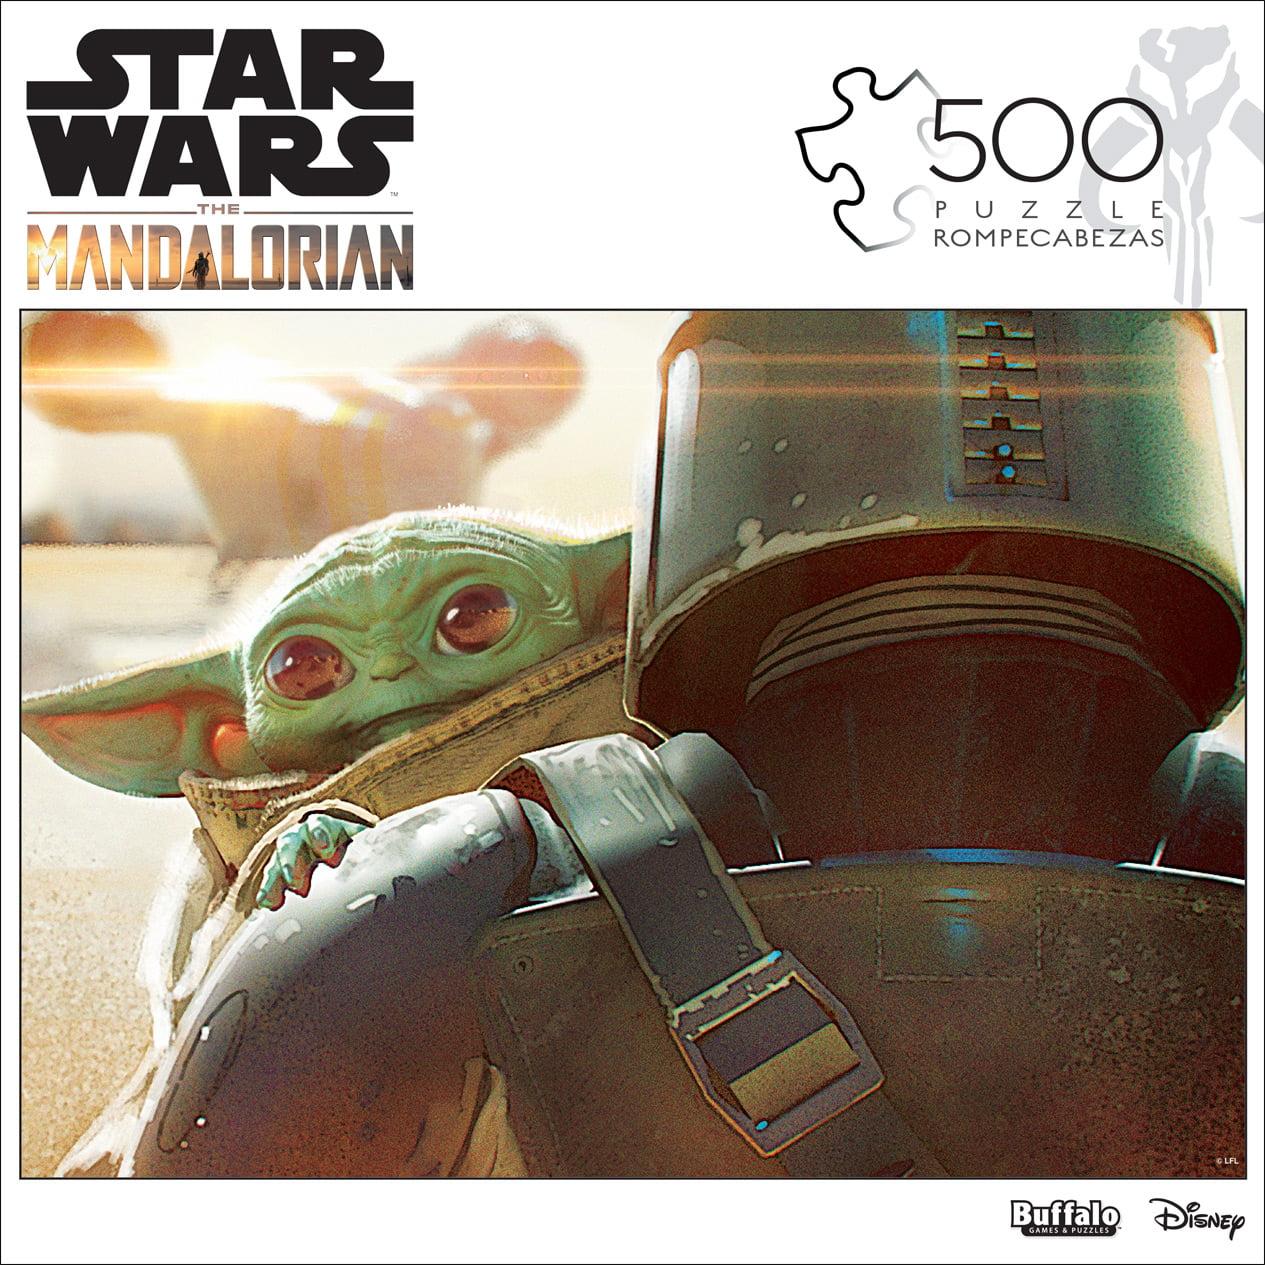 Star Wars Mandalorian The Child Baby Yoda Jigsaw Puzzle 500 Pcs Buffalo Disney